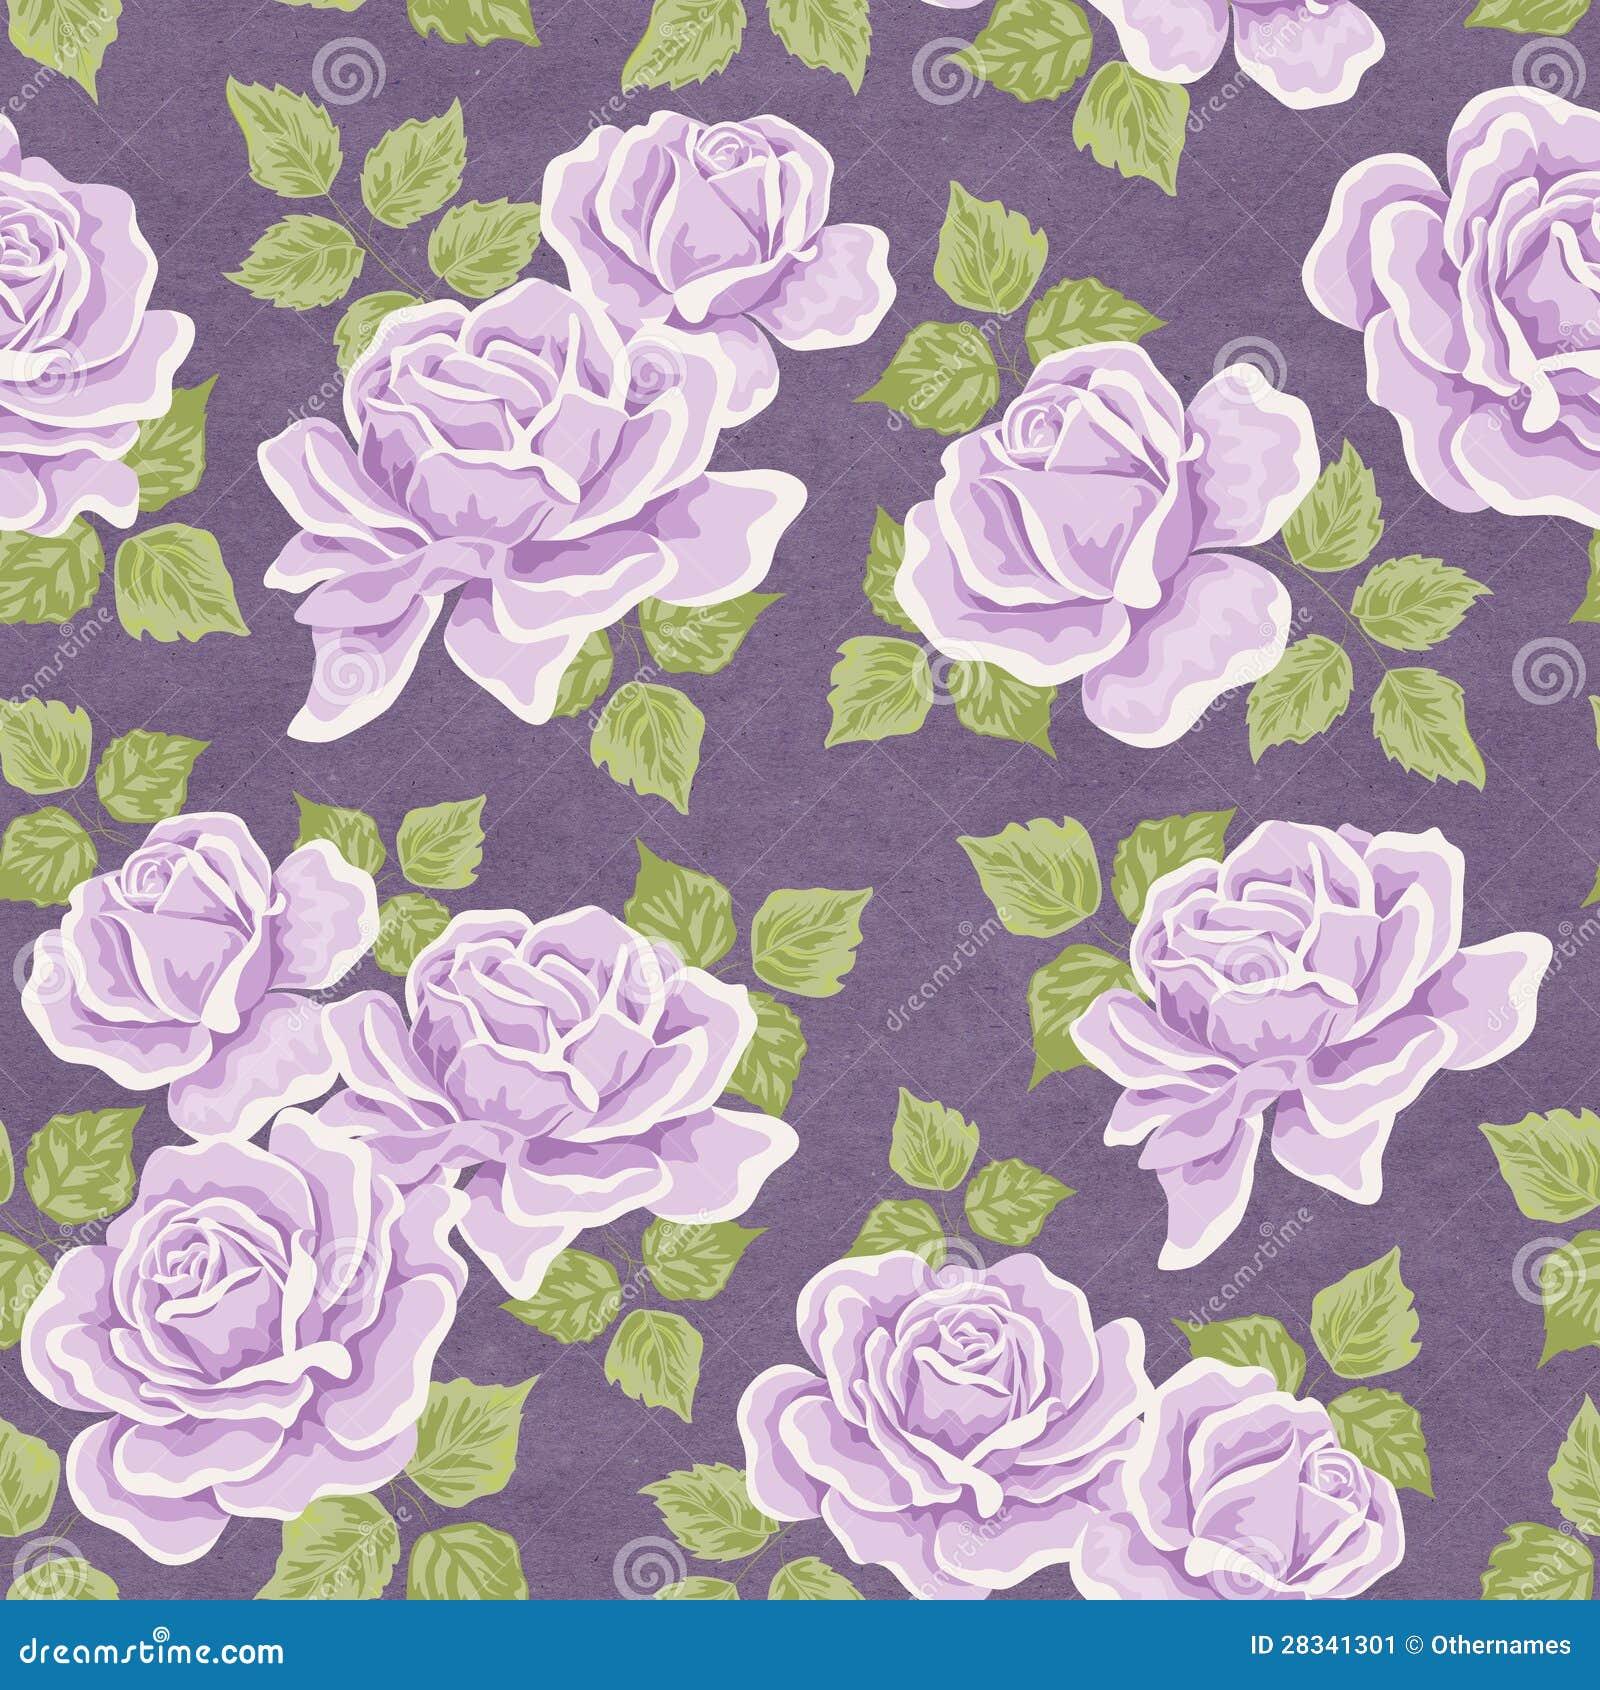 flowery wallpaper background stock illustration illustration of